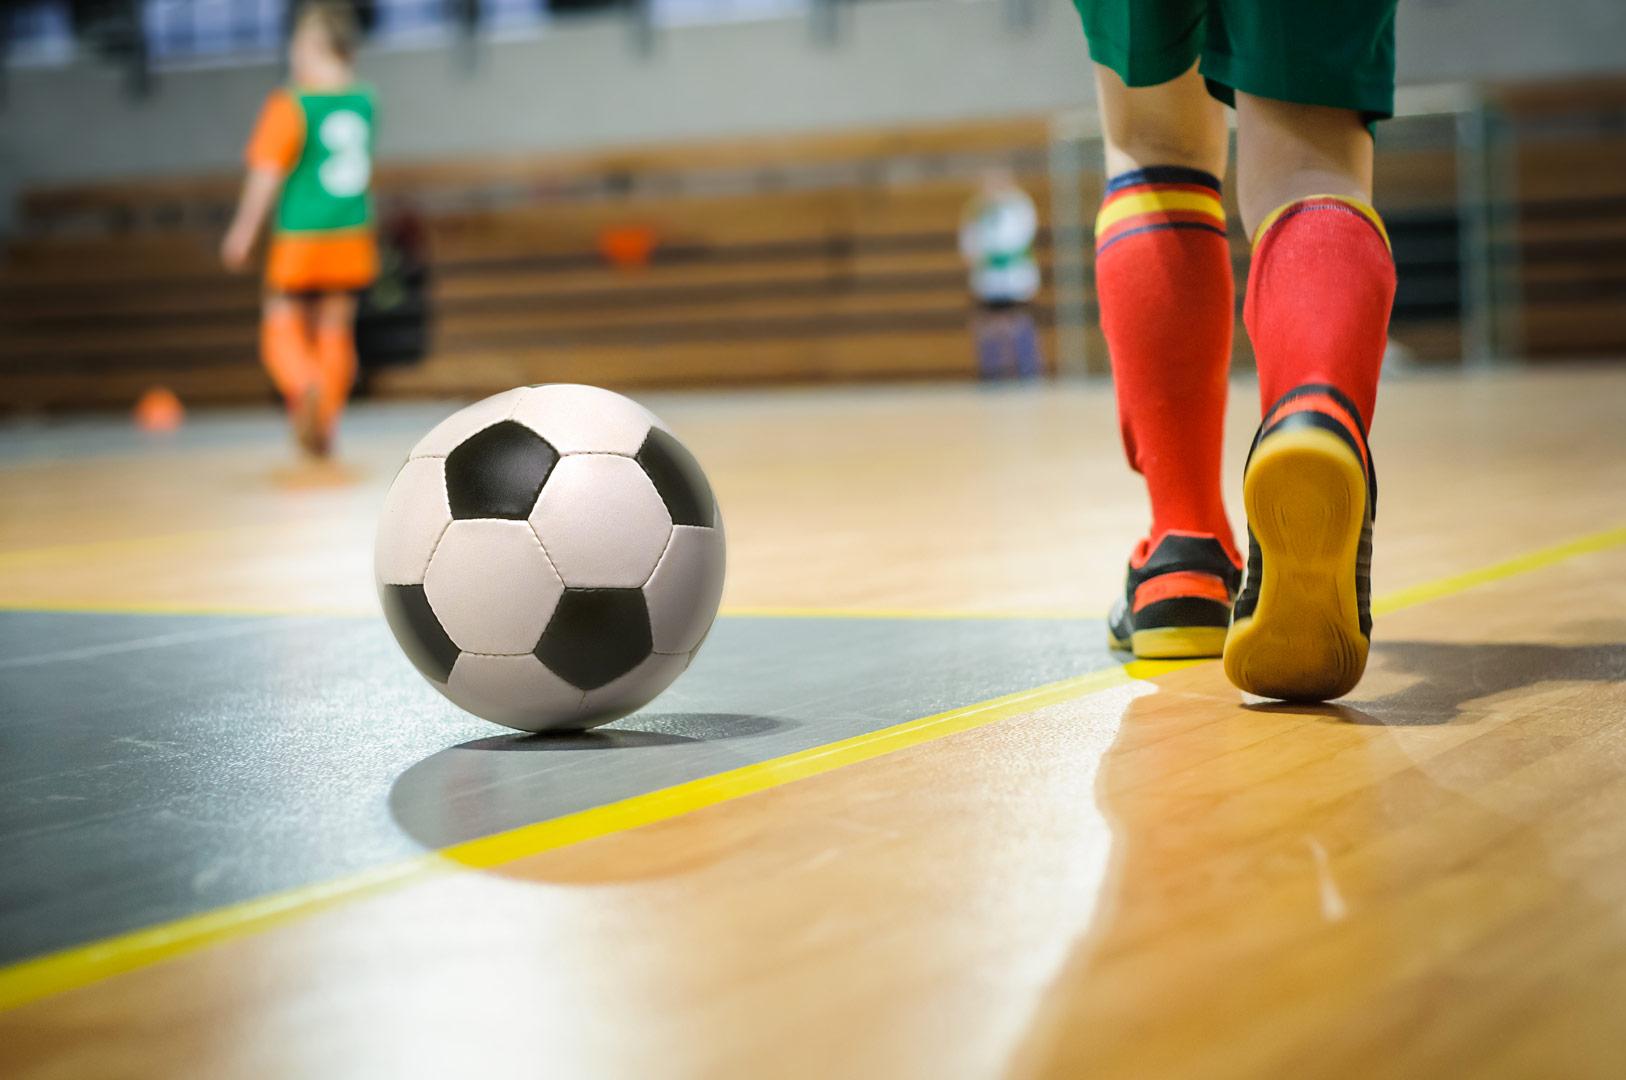 картинка футбол зал ноге ребенка